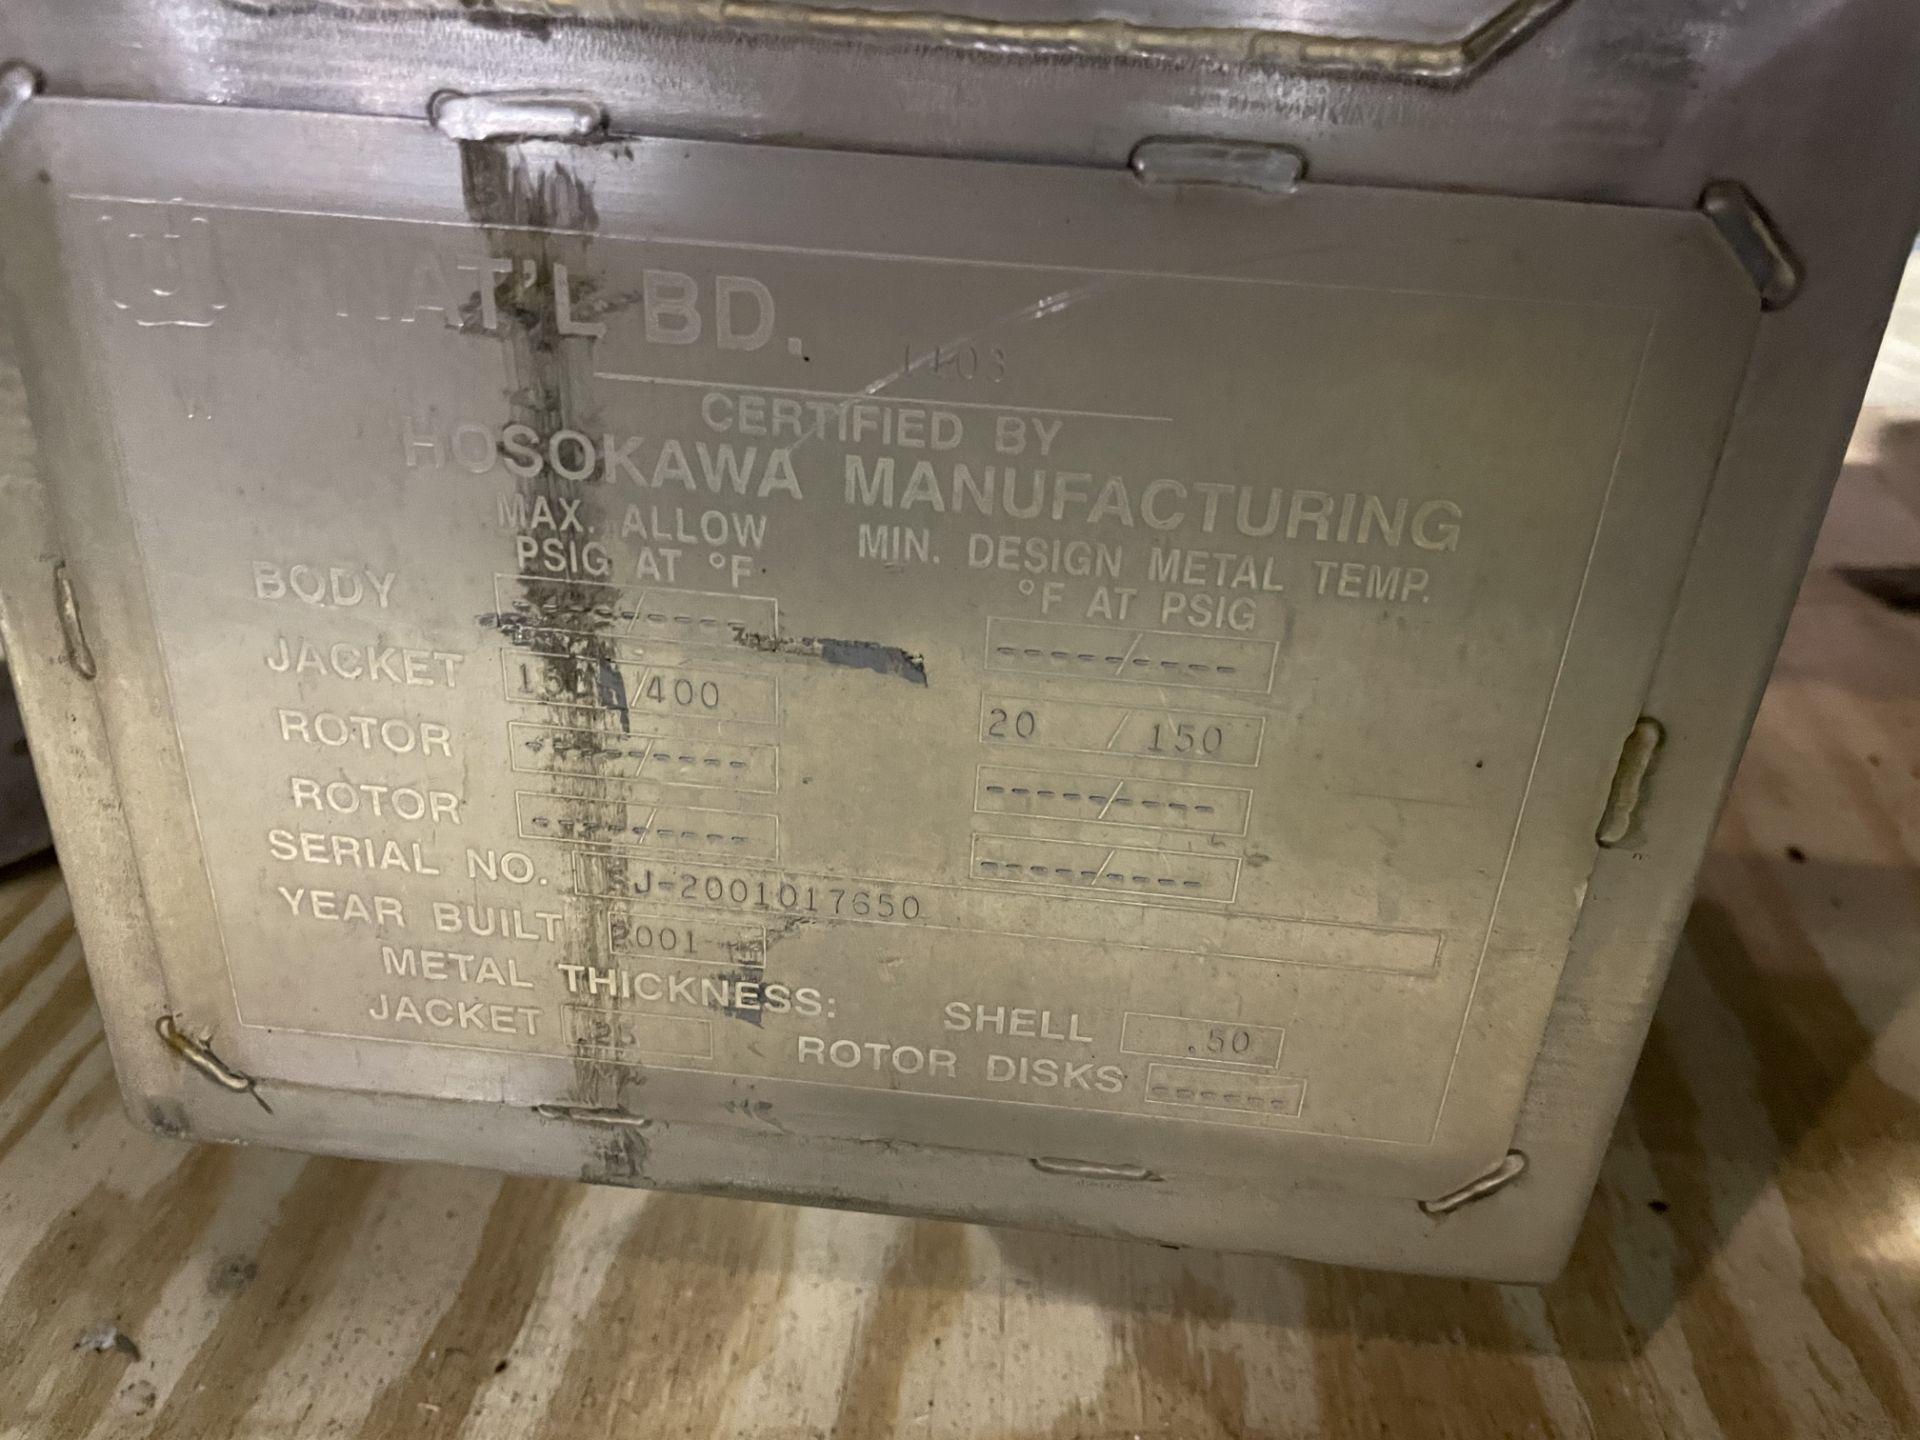 Bepex - Hosokawa Solidaire Thin Film Paddle Dryer Model SJS 24-14 S/N SJ-2001017650 With Mokon Model - Image 7 of 12